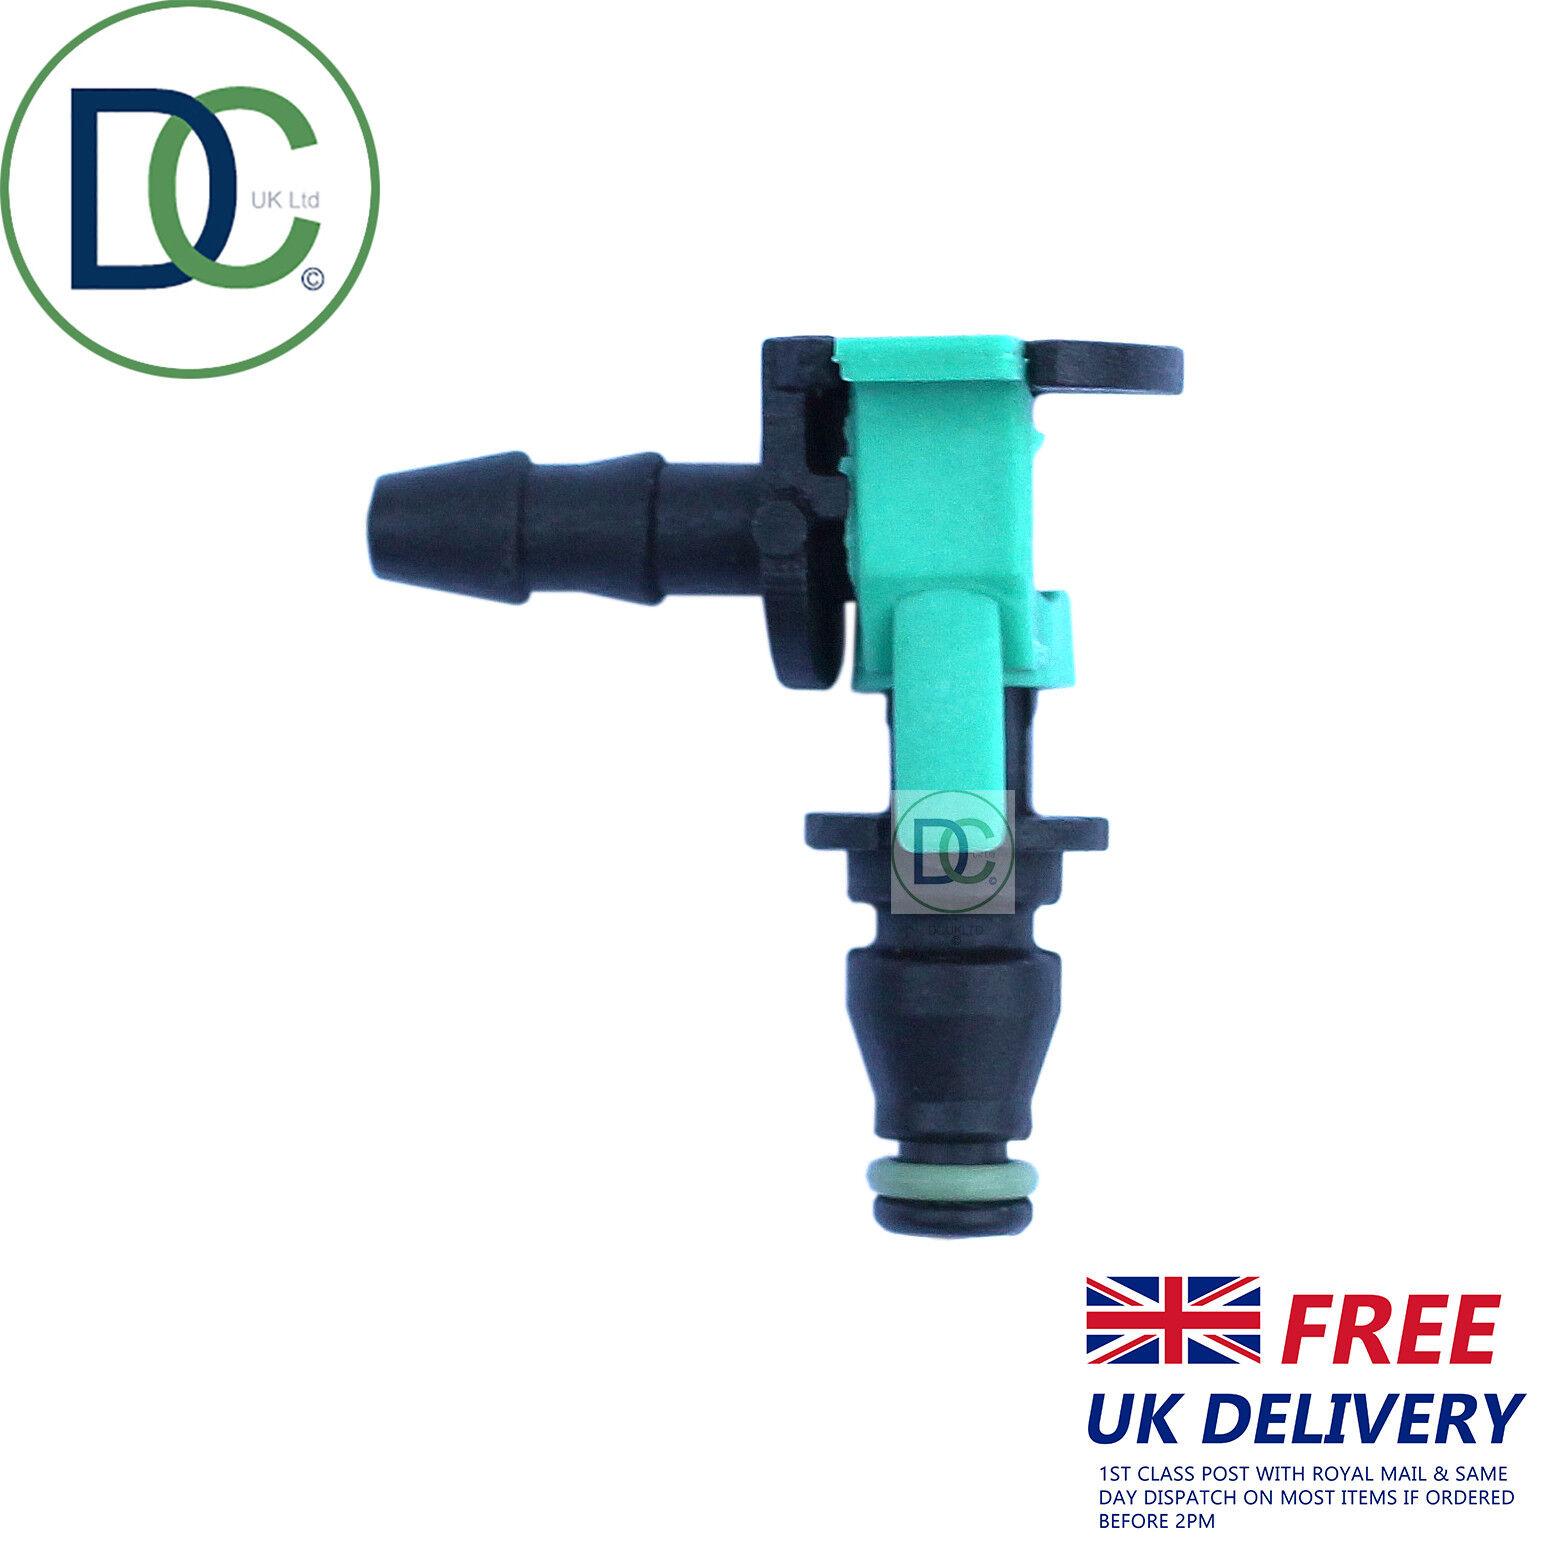 Ford Focus Diesel Injector Leak Off Connector Kit Siemens 4 Cylinder